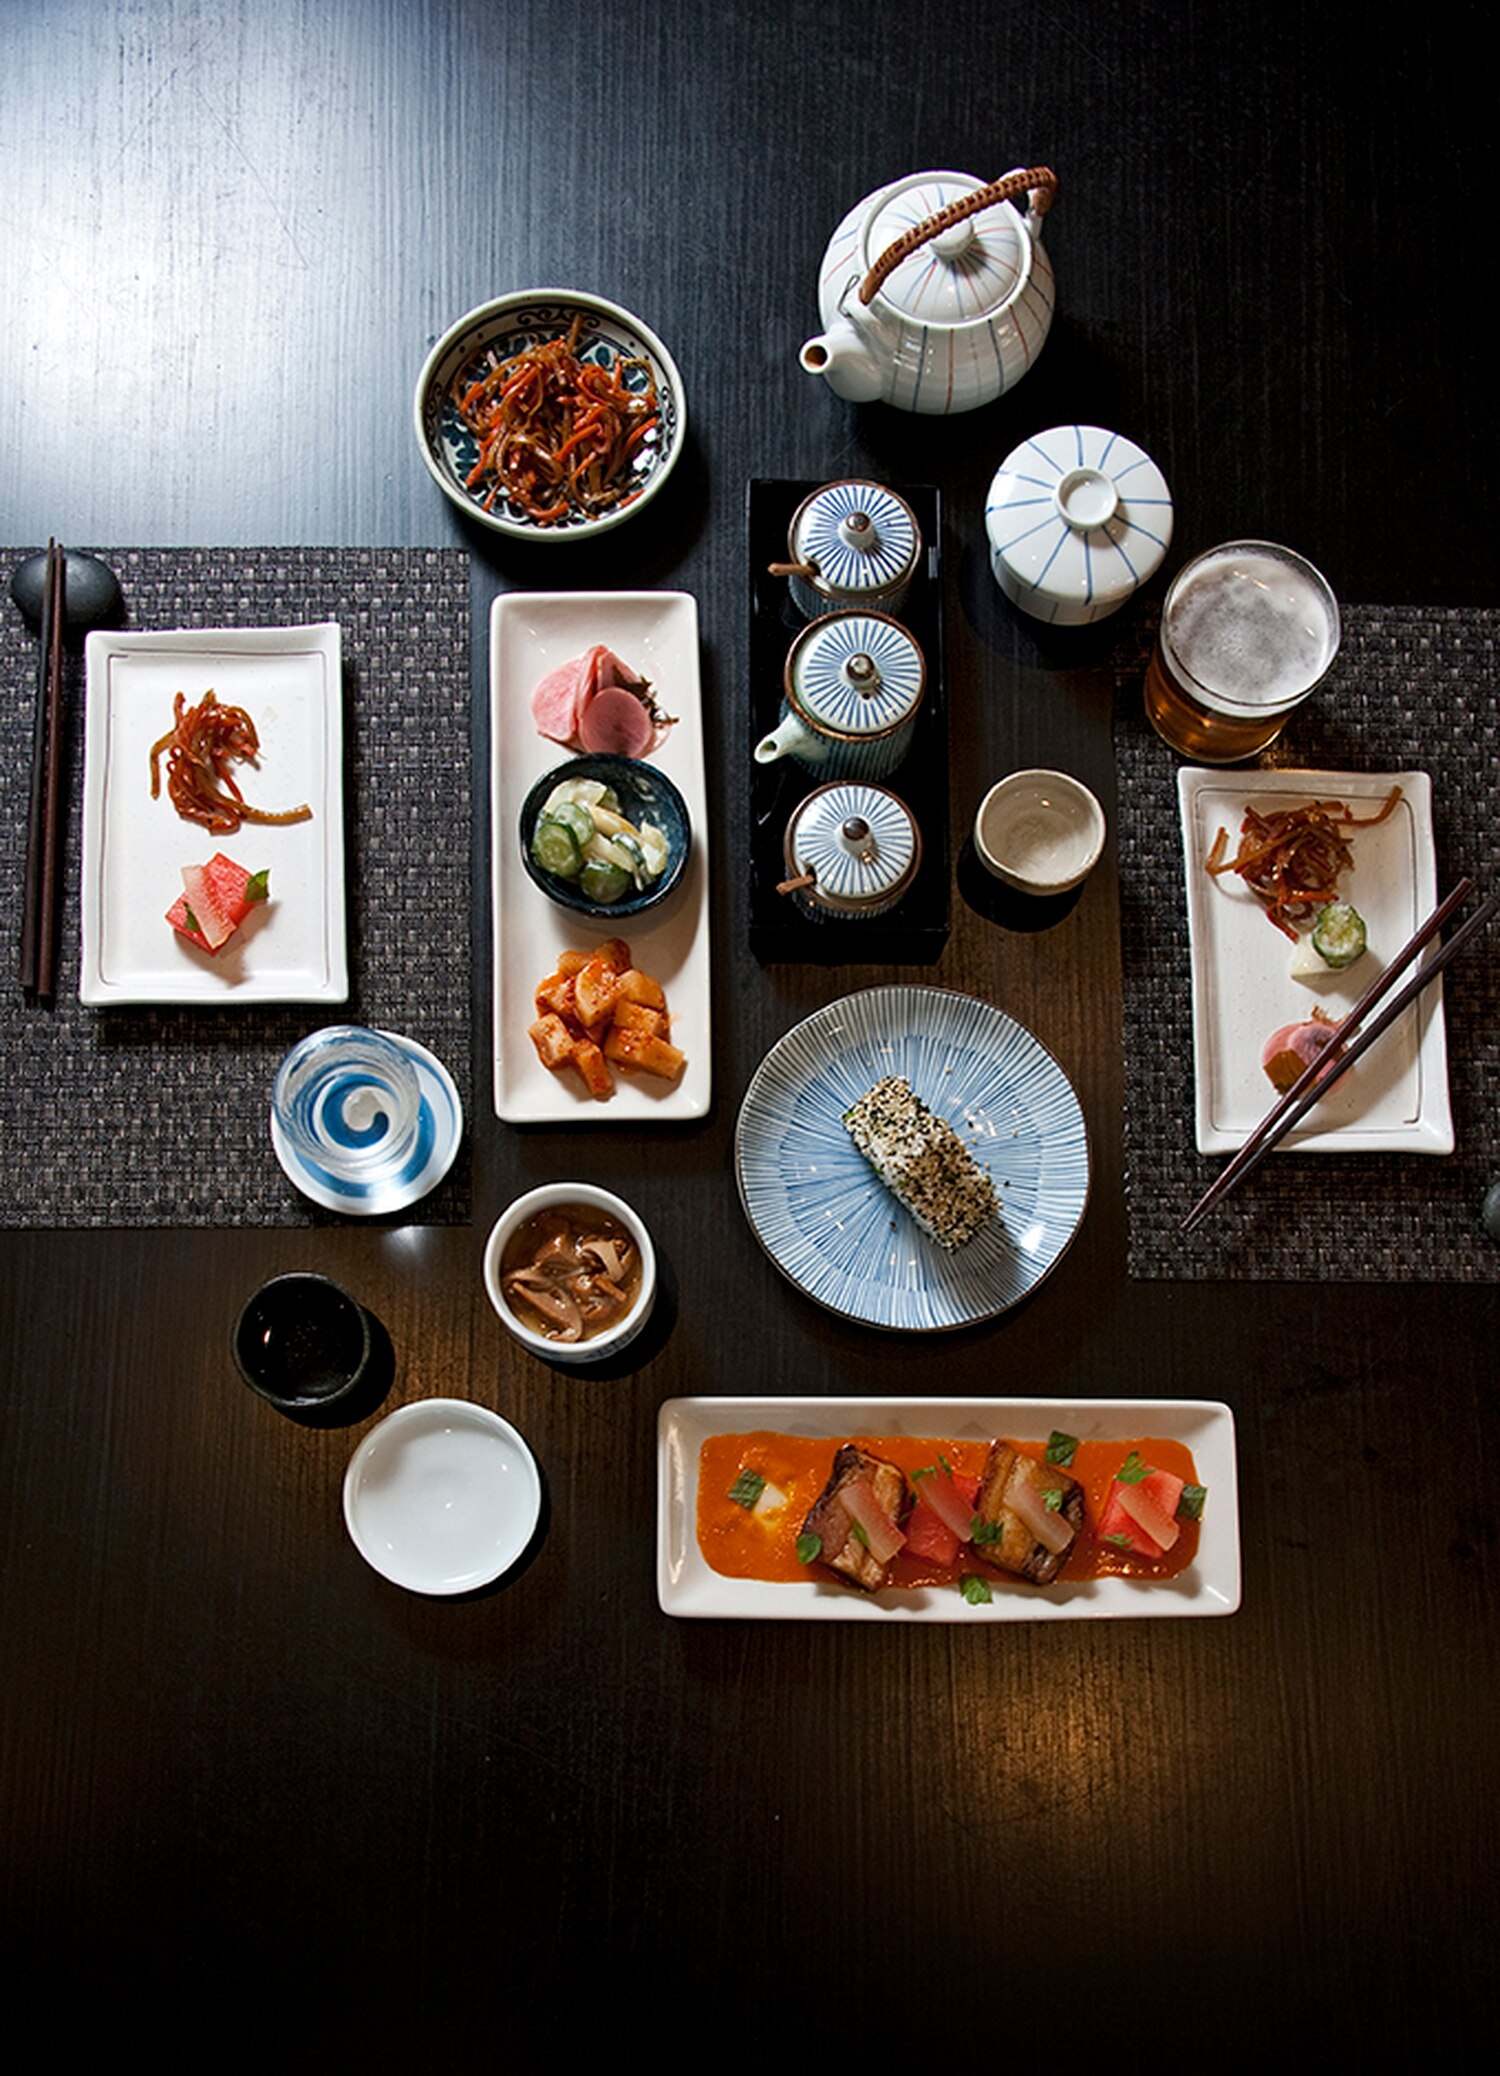 Bottom to top: Pork belly kakuni with watermelon; onigiri; pickle selection; kinpira gobo